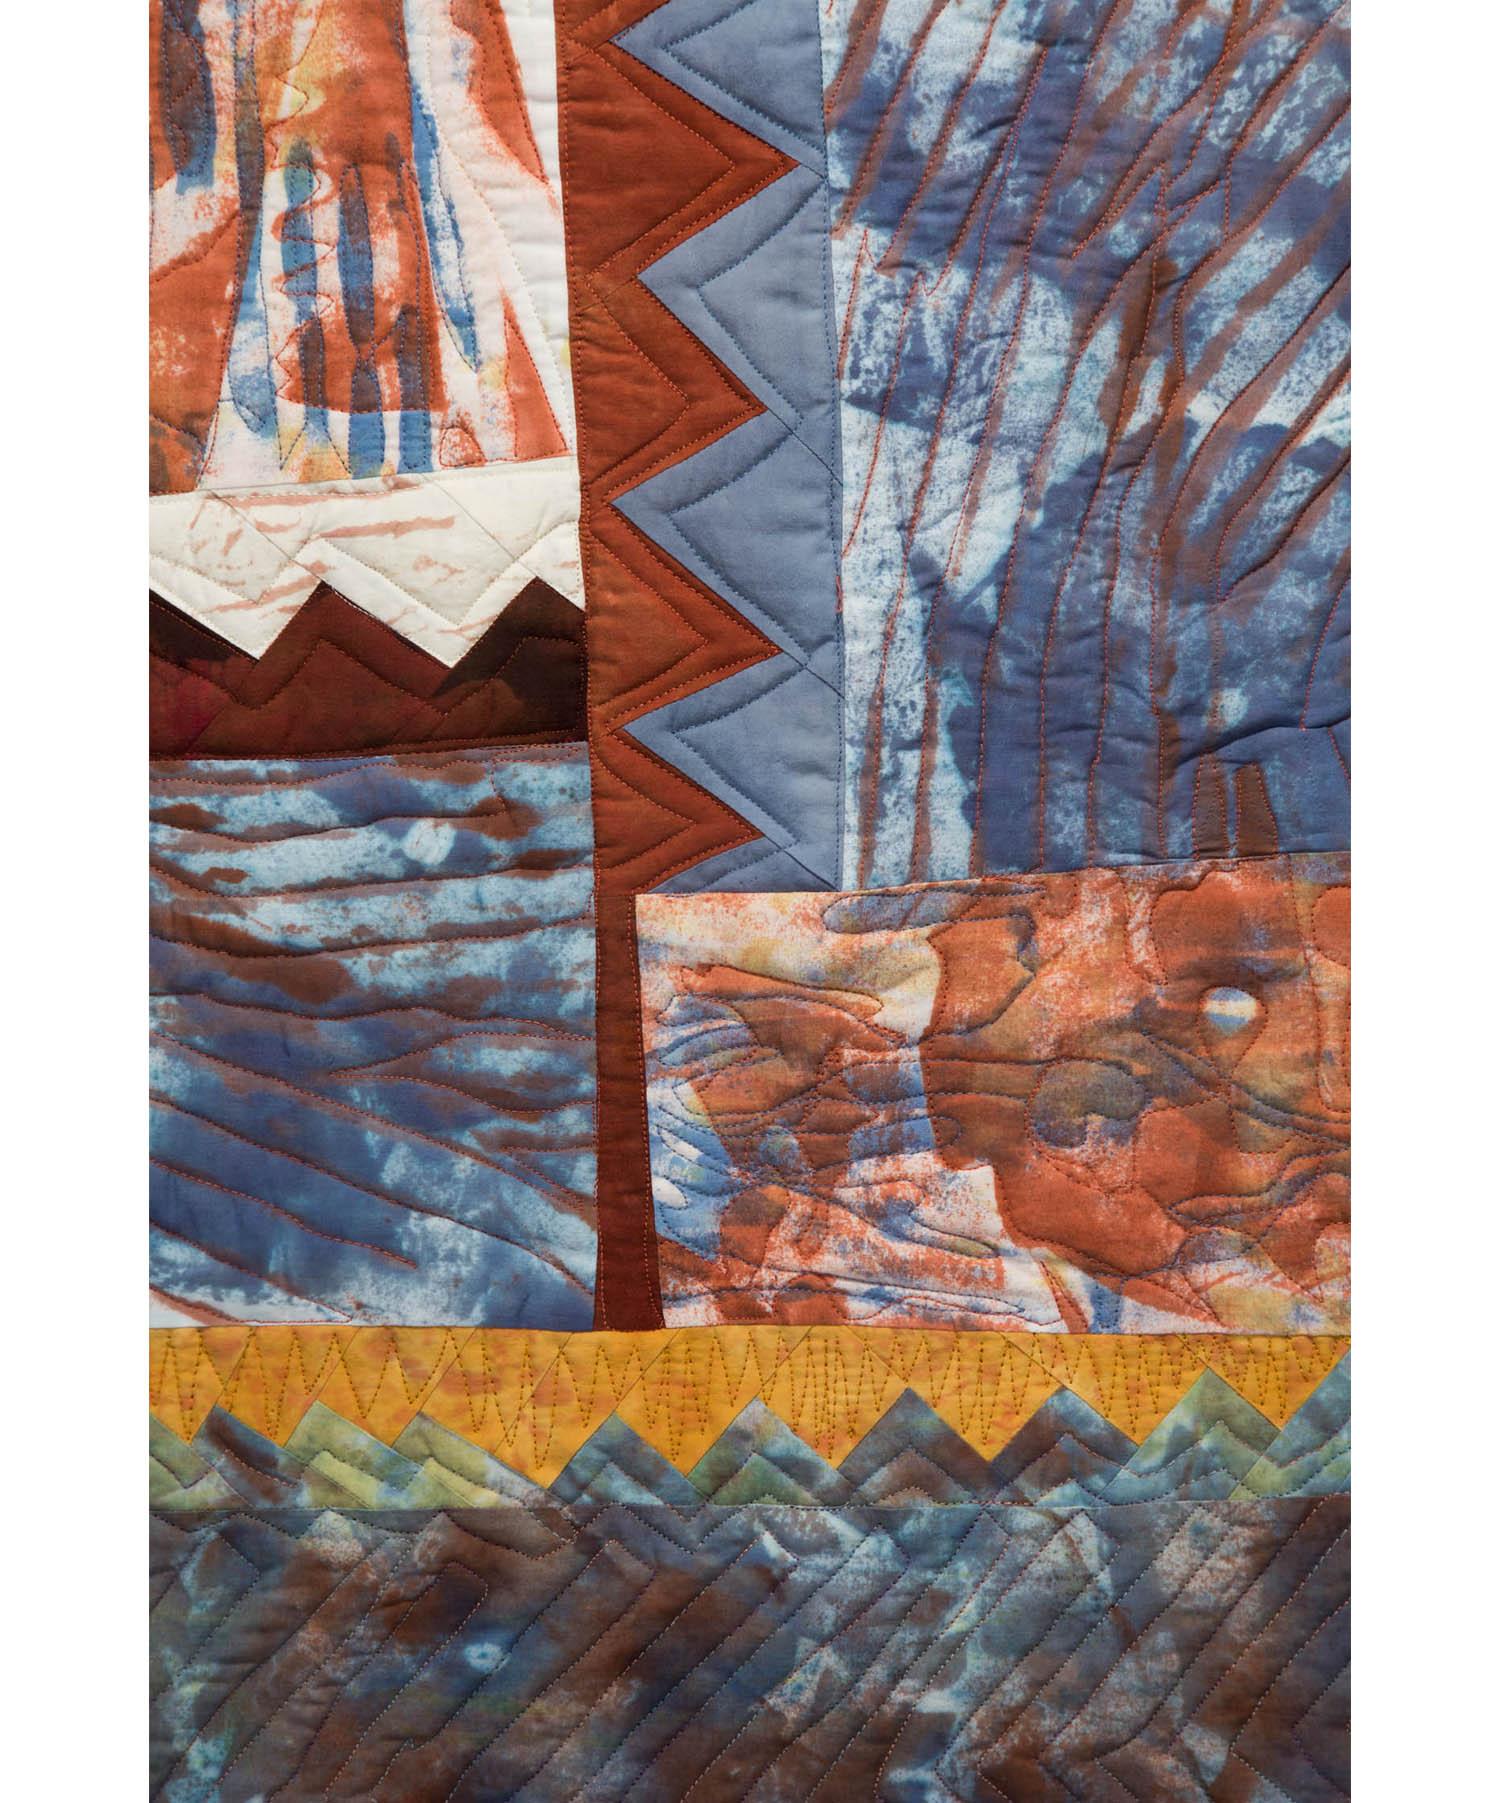 Sawblades 10- Blue Haze, detail